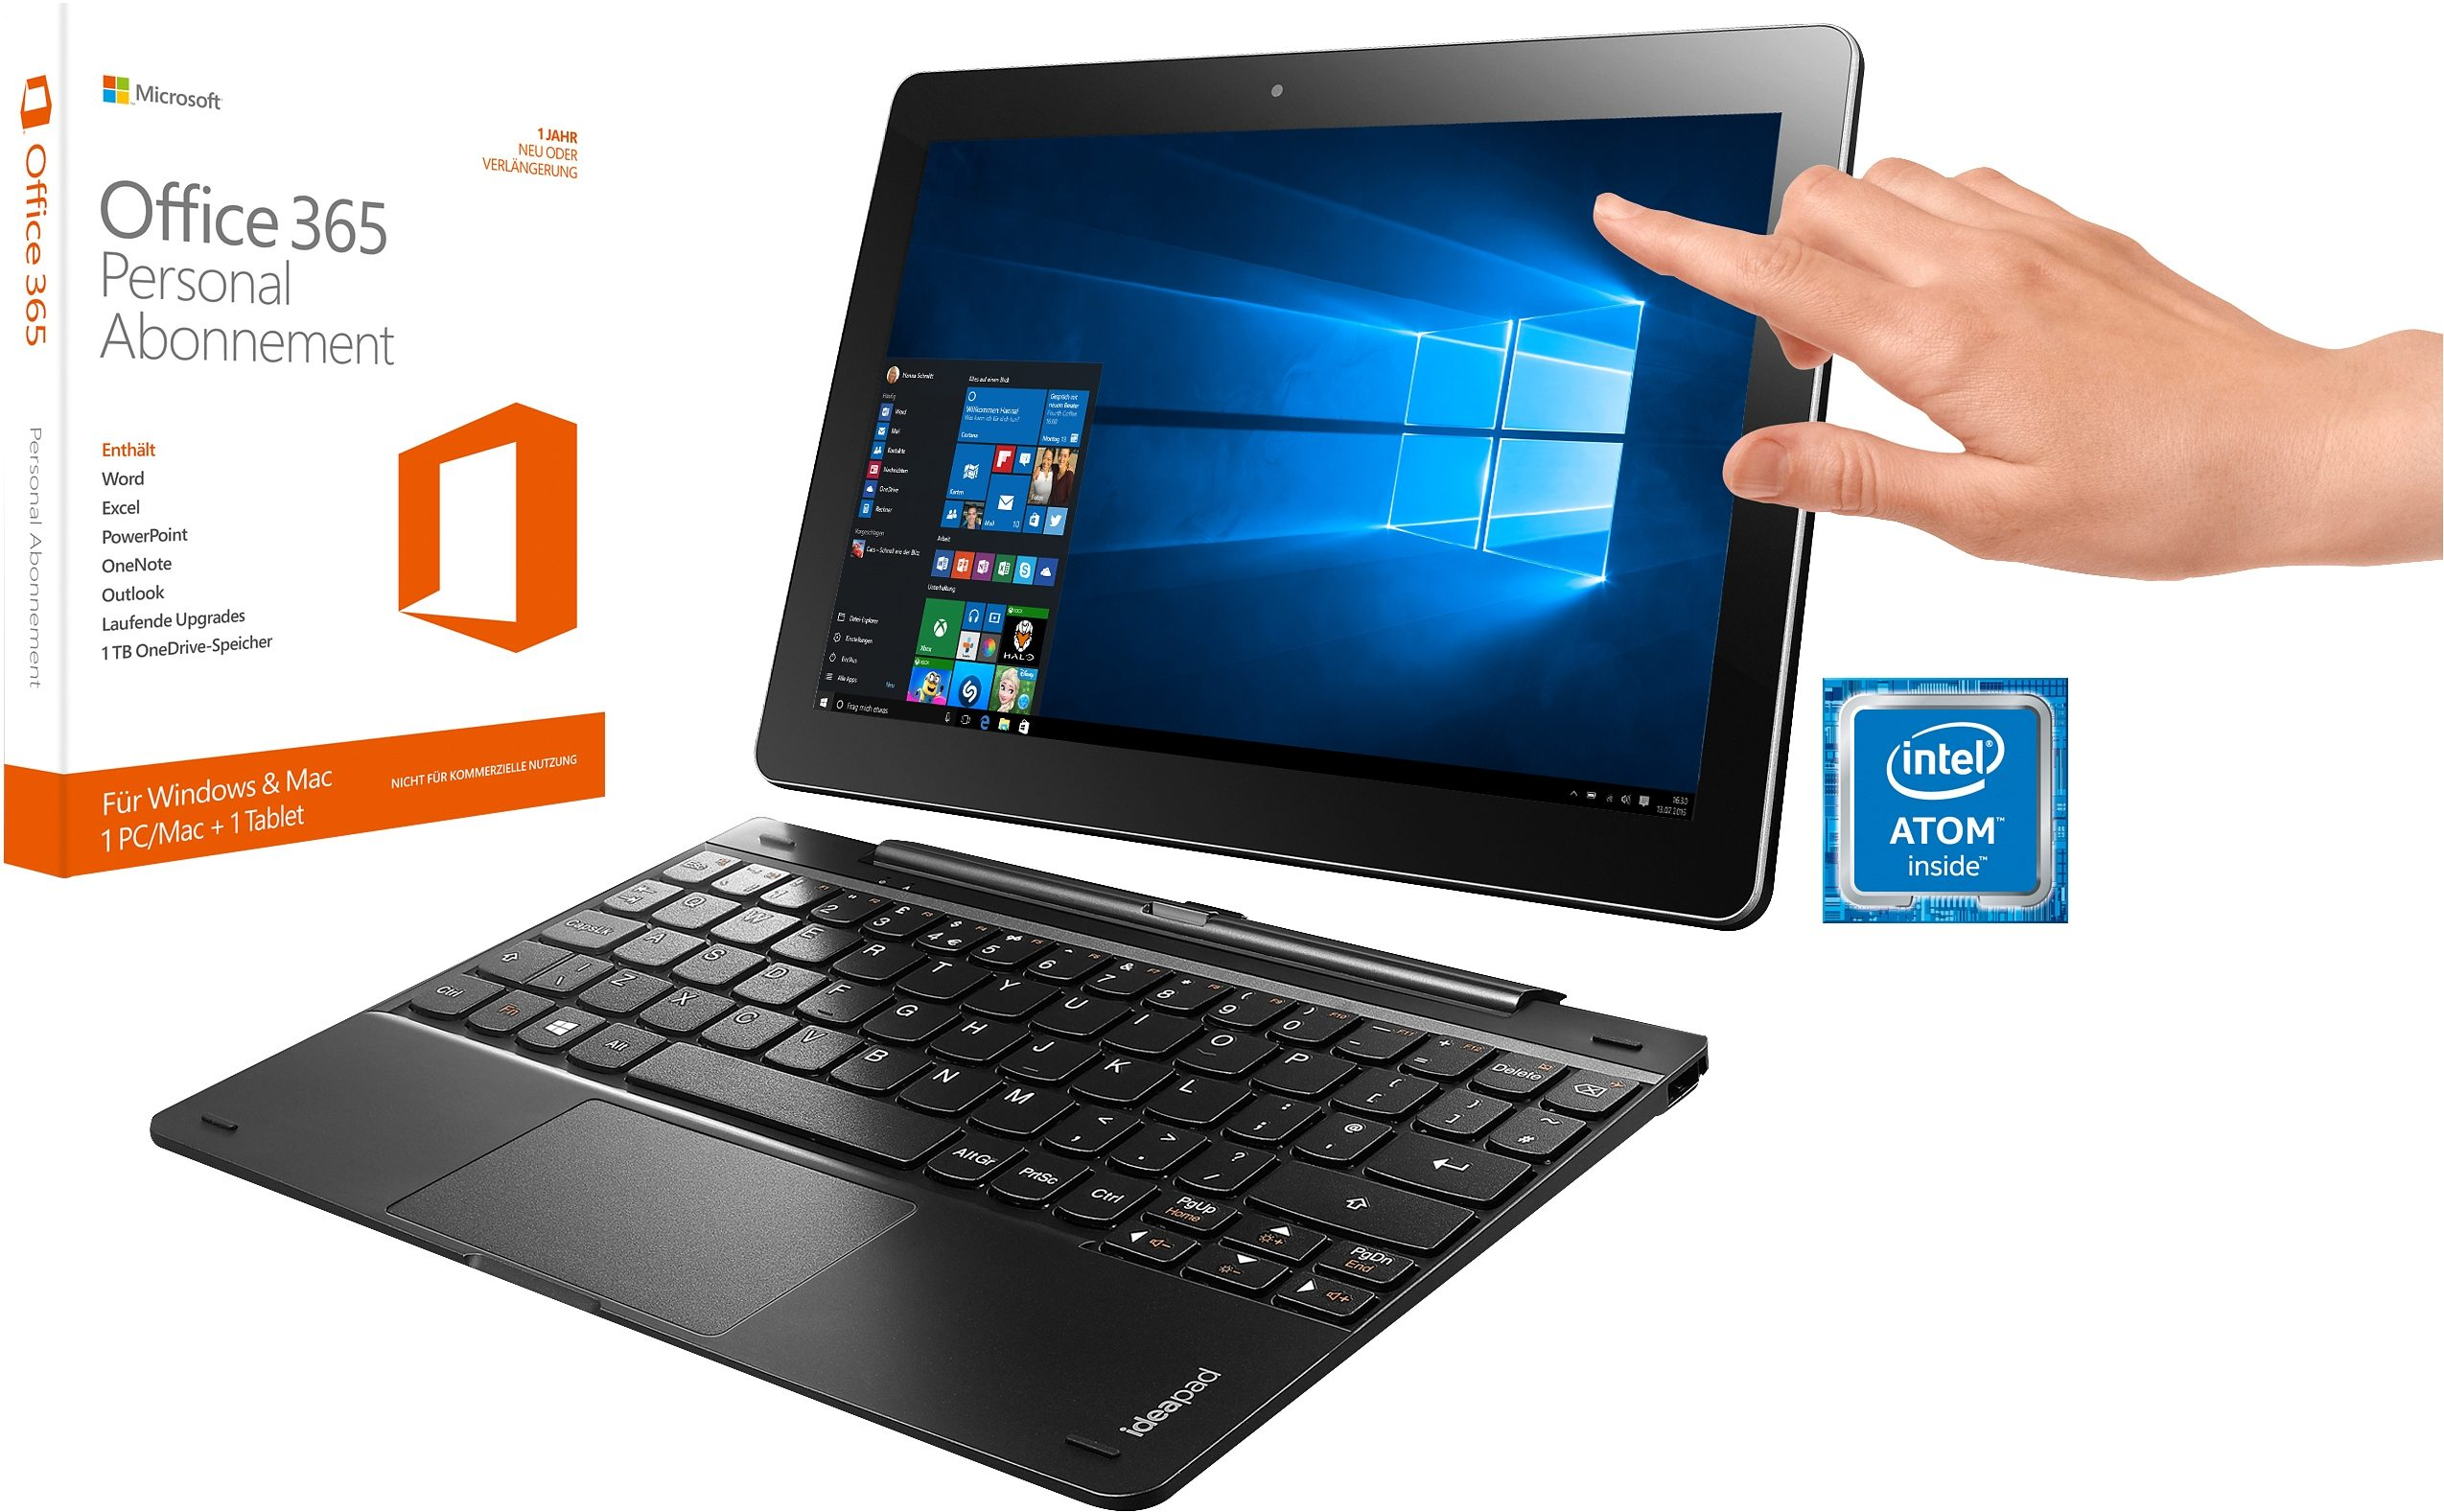 Lenovo Miix 300-10IBY Tablet-PC, Microsoft® Windows® 10 Home (32Bit), Intel Atom Z3735F